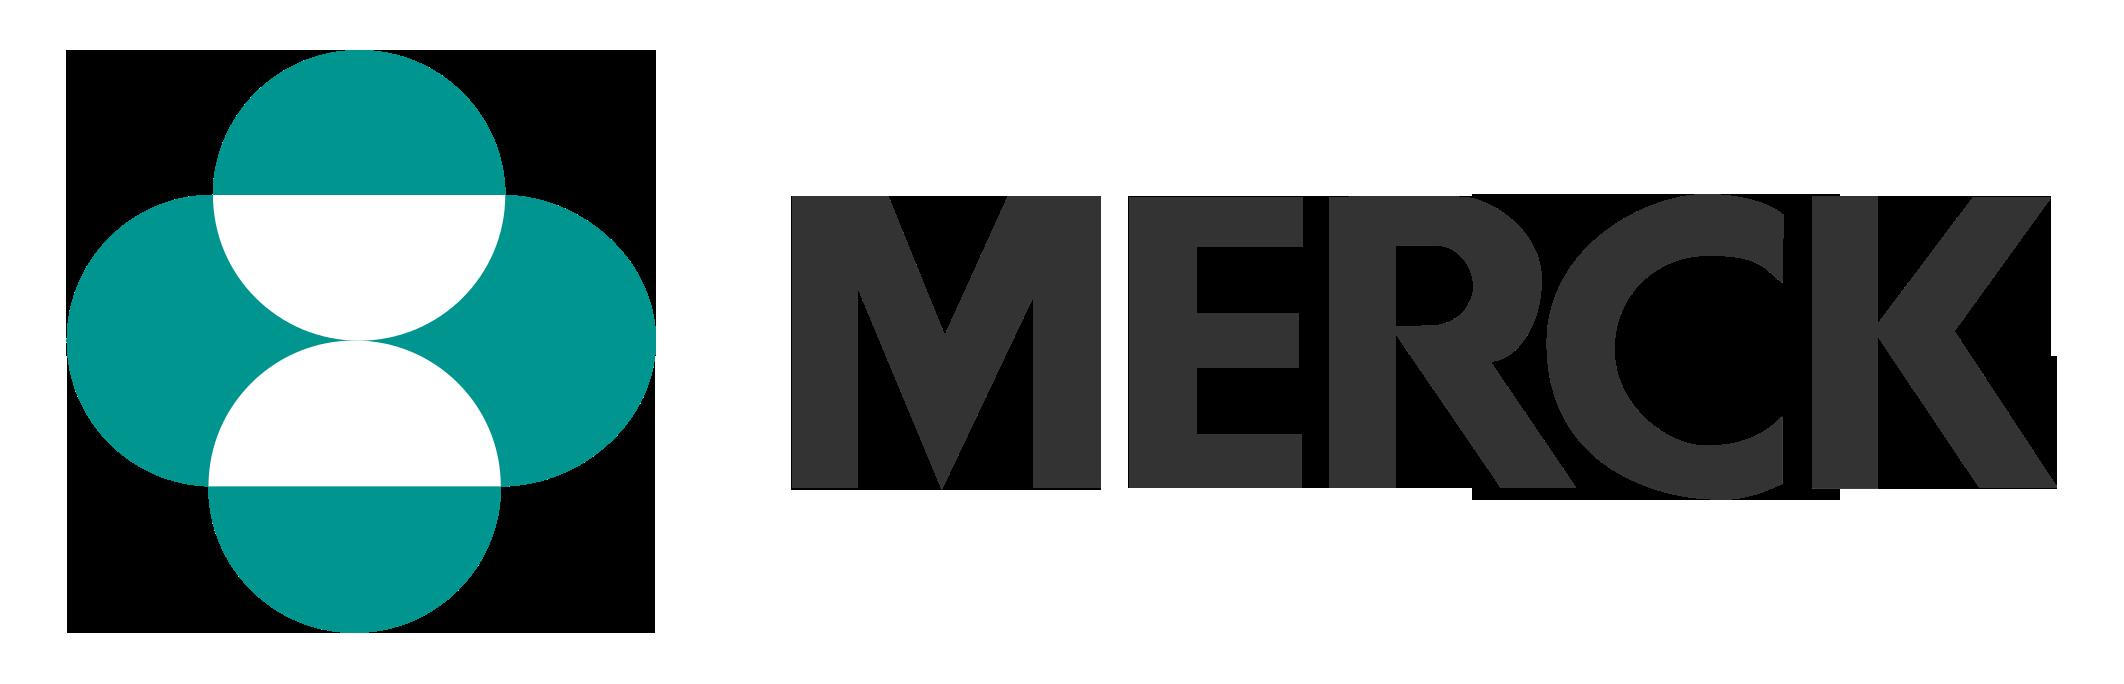 merck logo png image purepng free transparent cc0 png